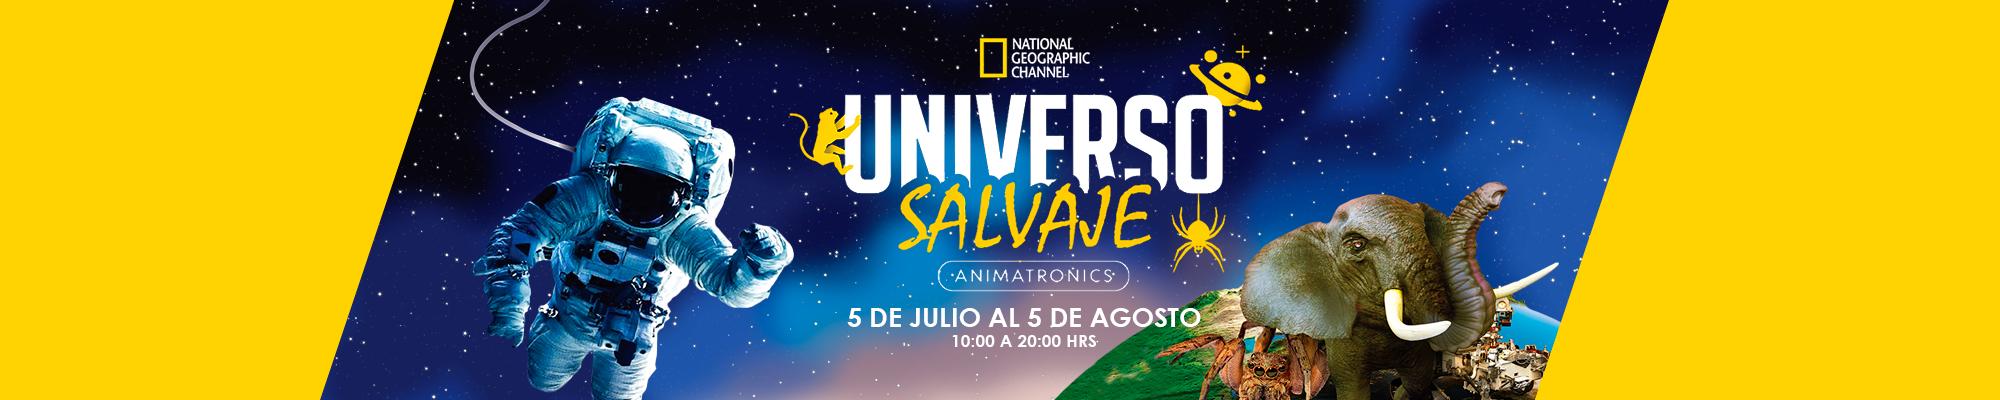 Universo Salvaje National Geographic